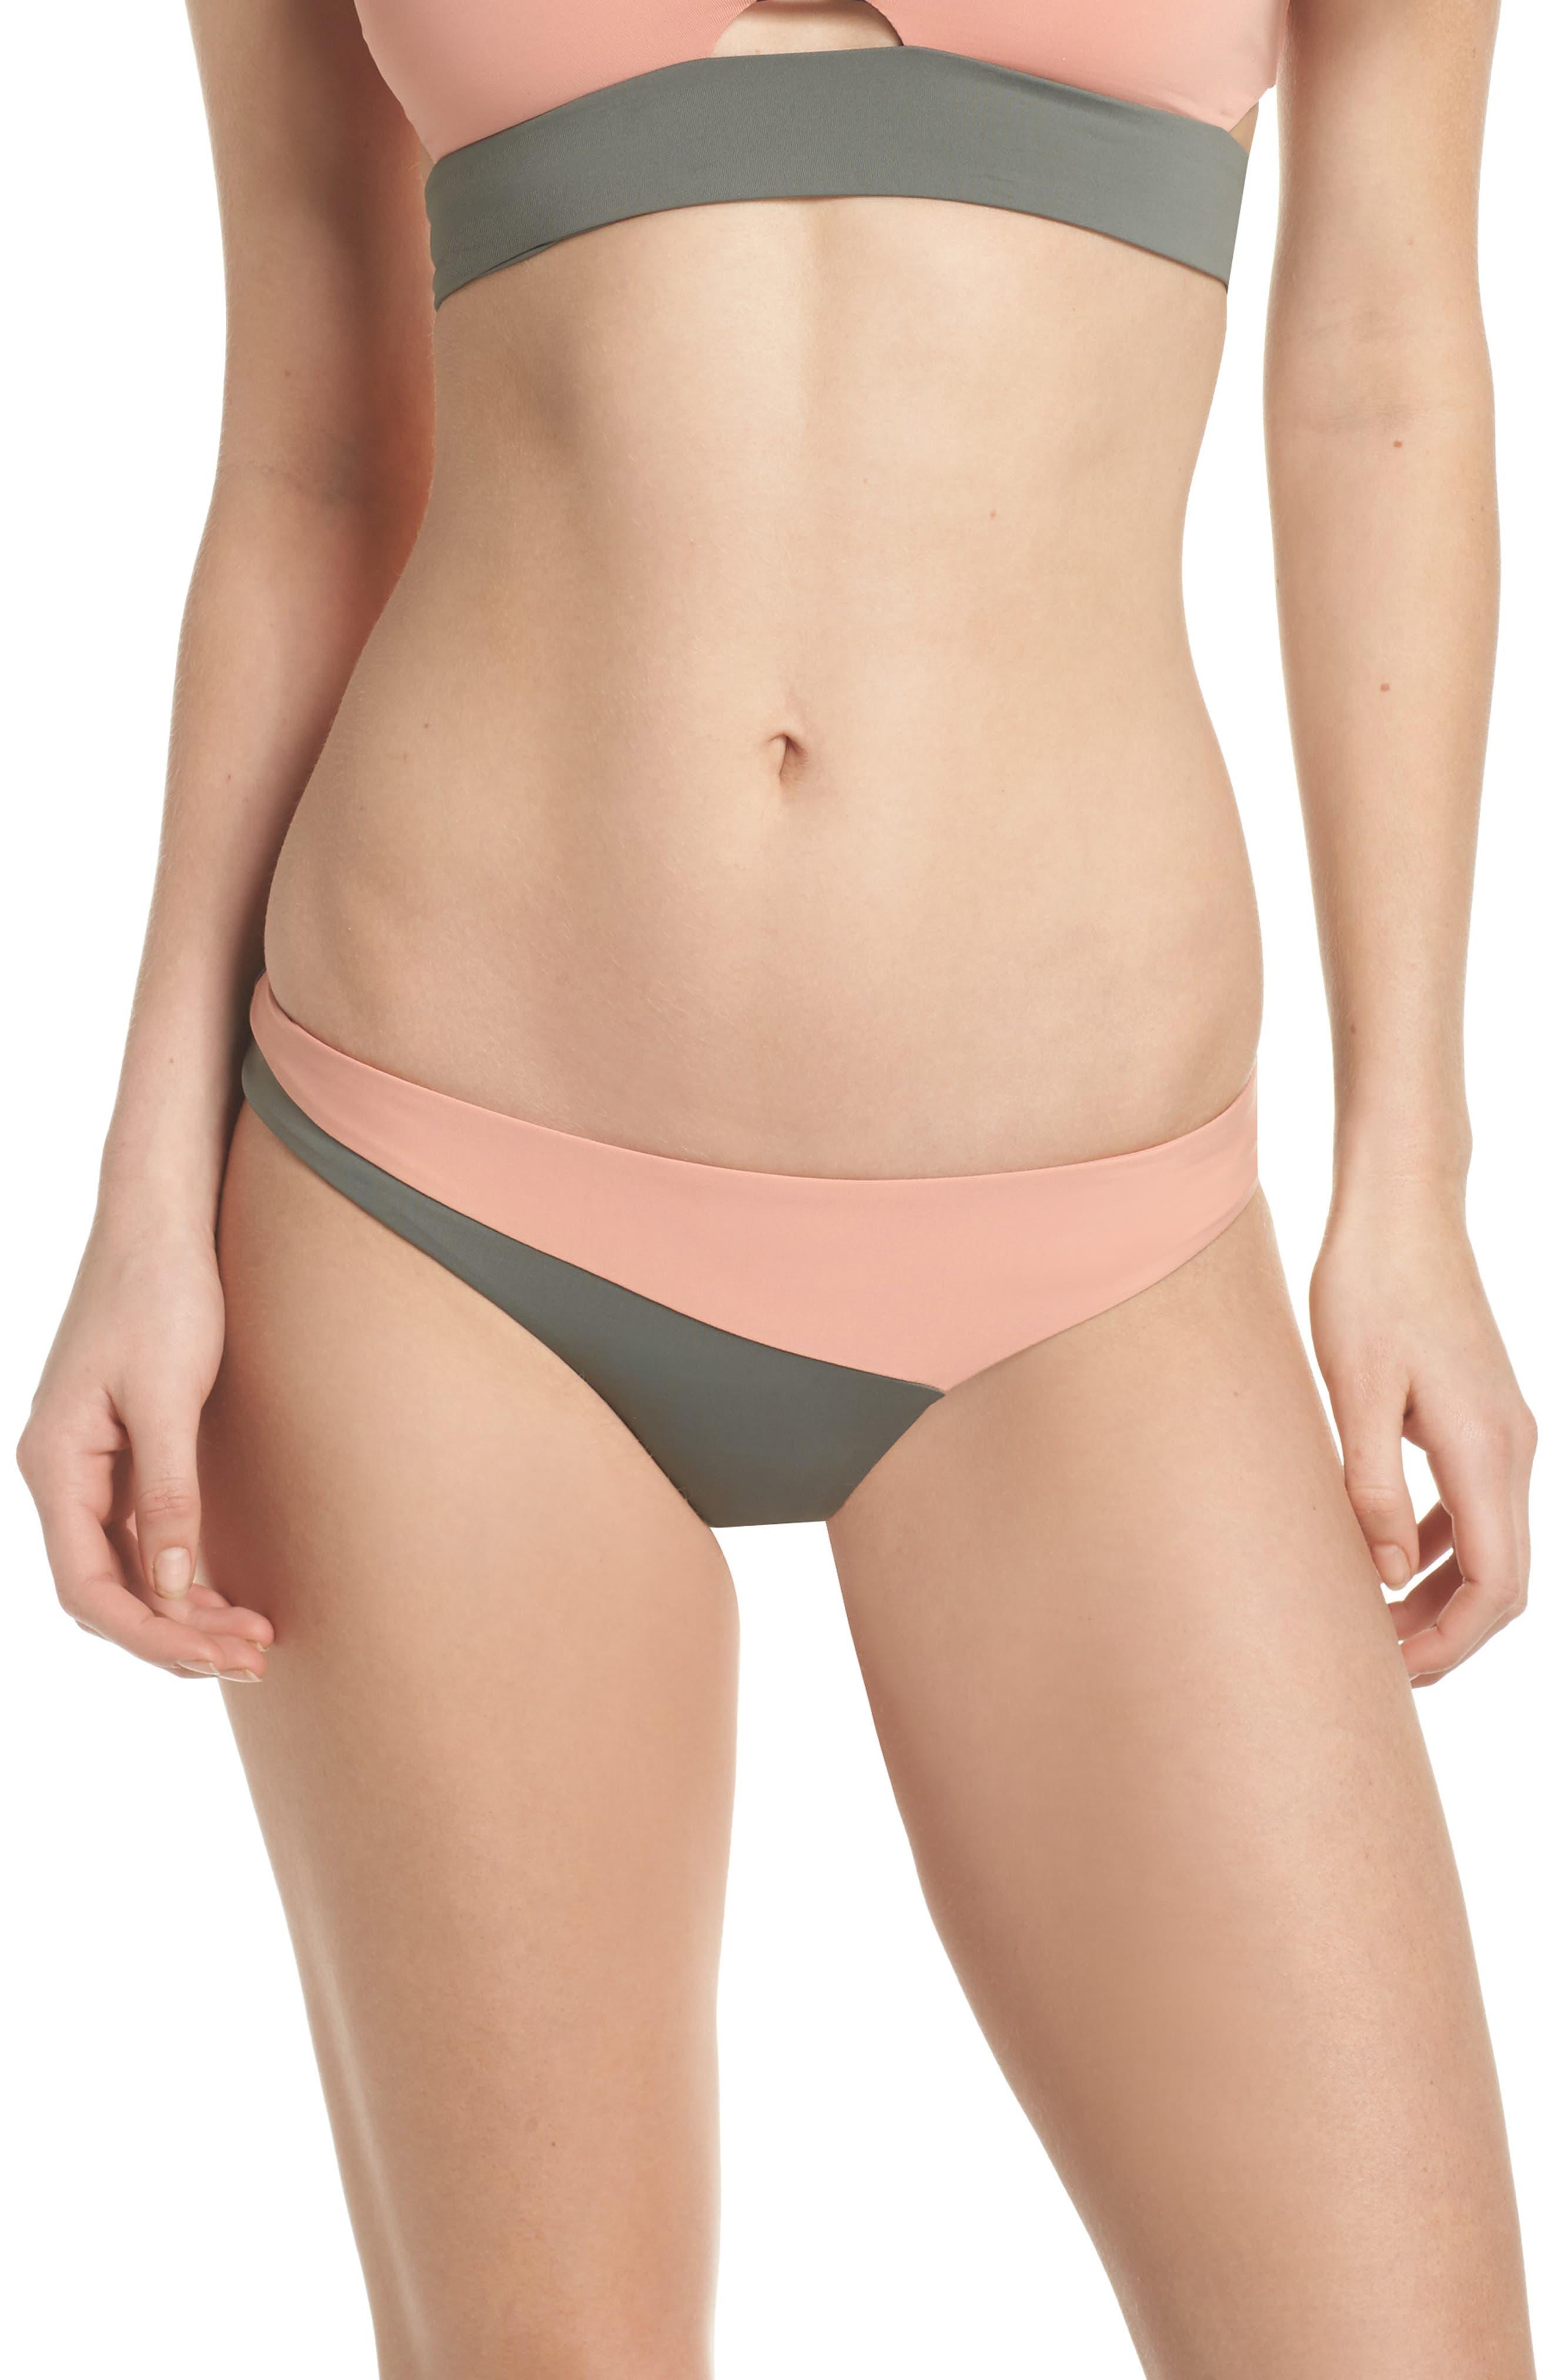 Jaclyn Hipster Bikini Bottoms,                         Main,                         color, Desert Clay/ Cove Grey